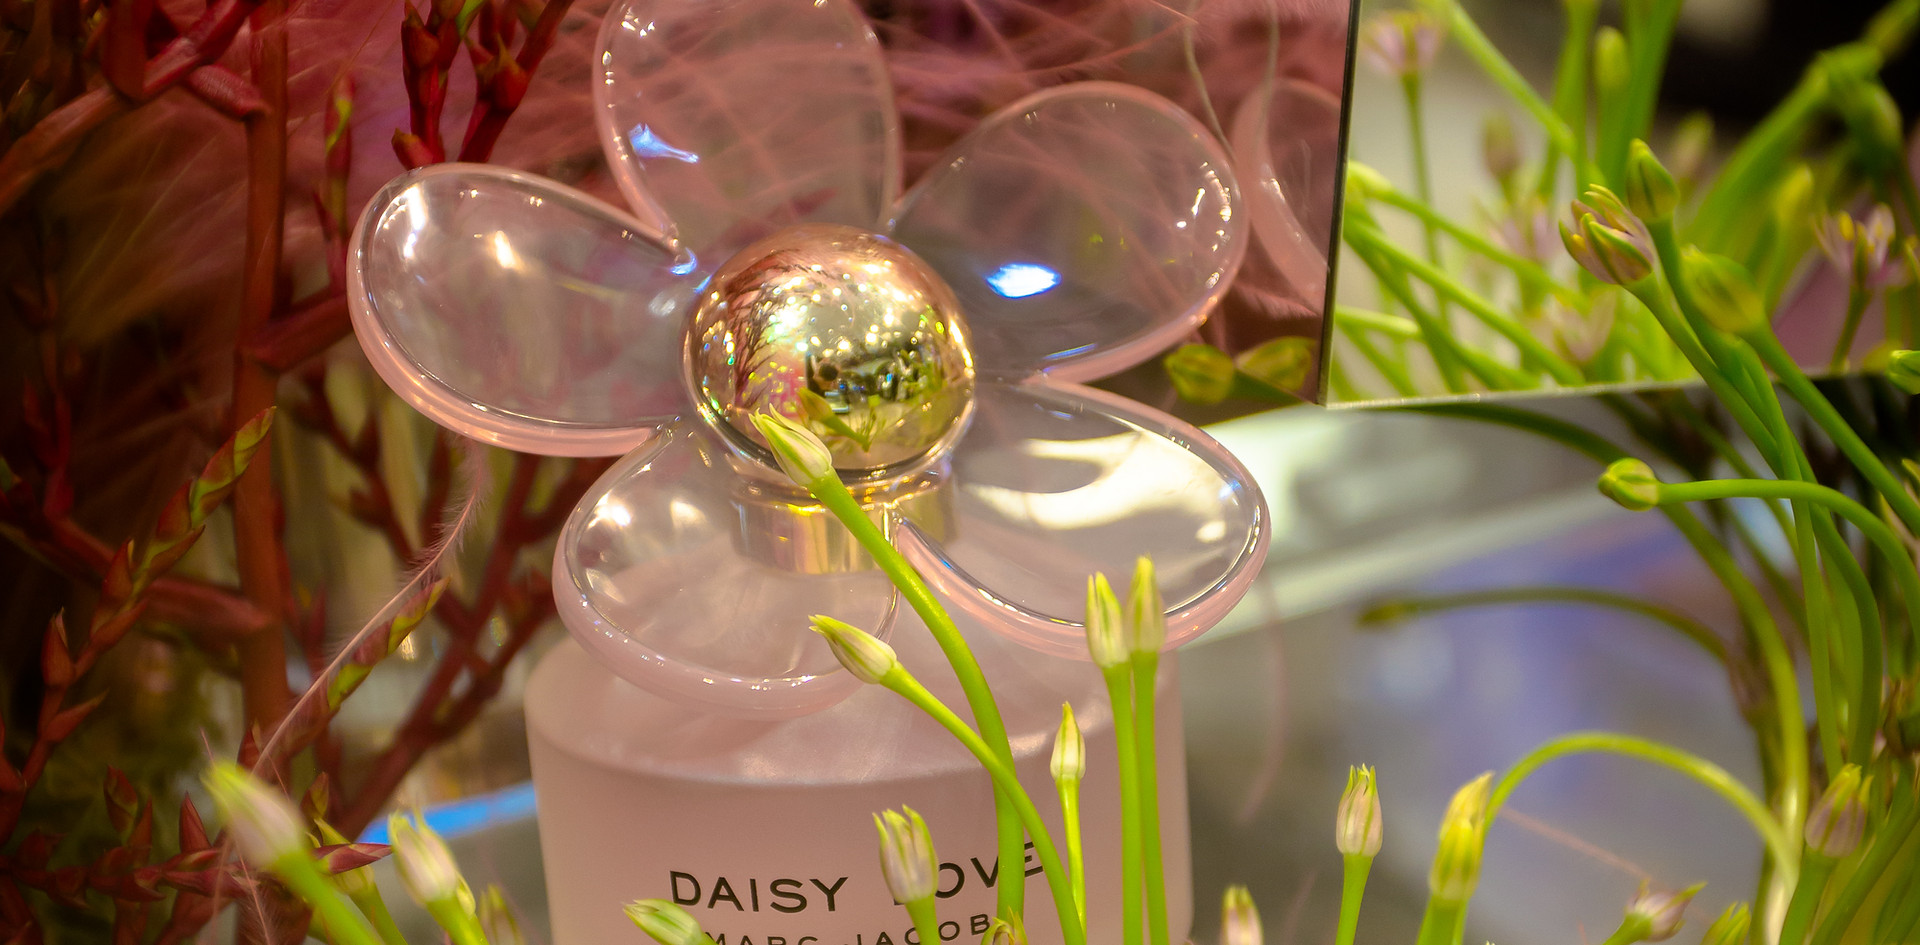 MJ Daisy bottle shot from Flower show, Macy's HSQ